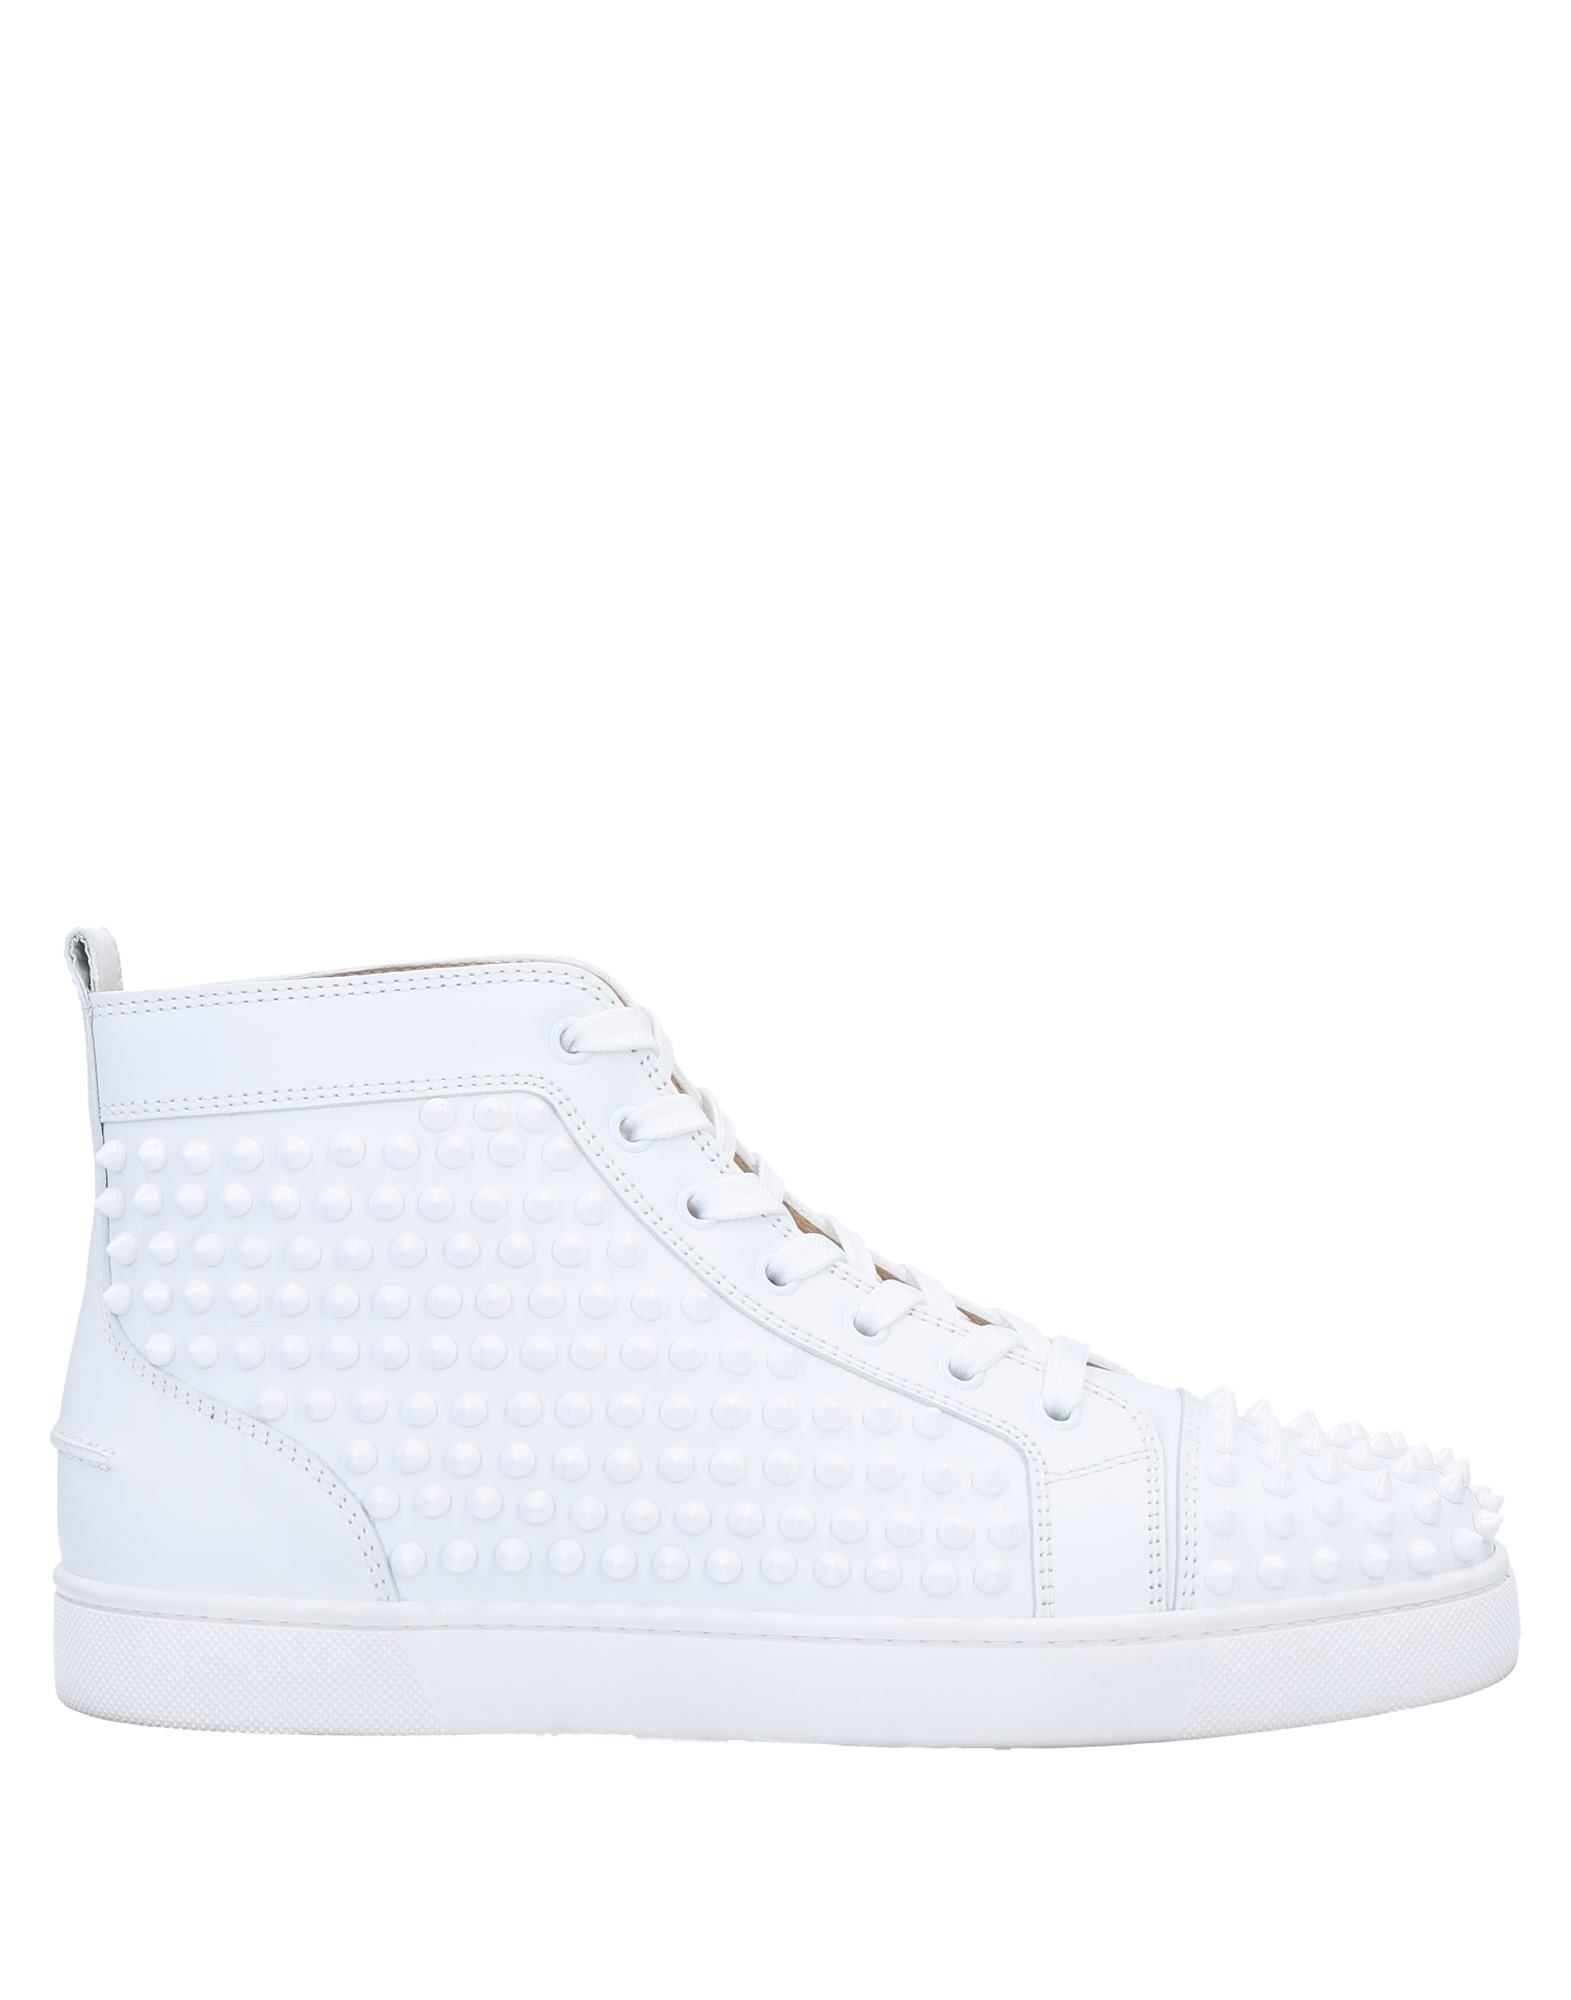 CHRISTIAN LOUBOUTIN High-tops & sneakers - Item 17004021